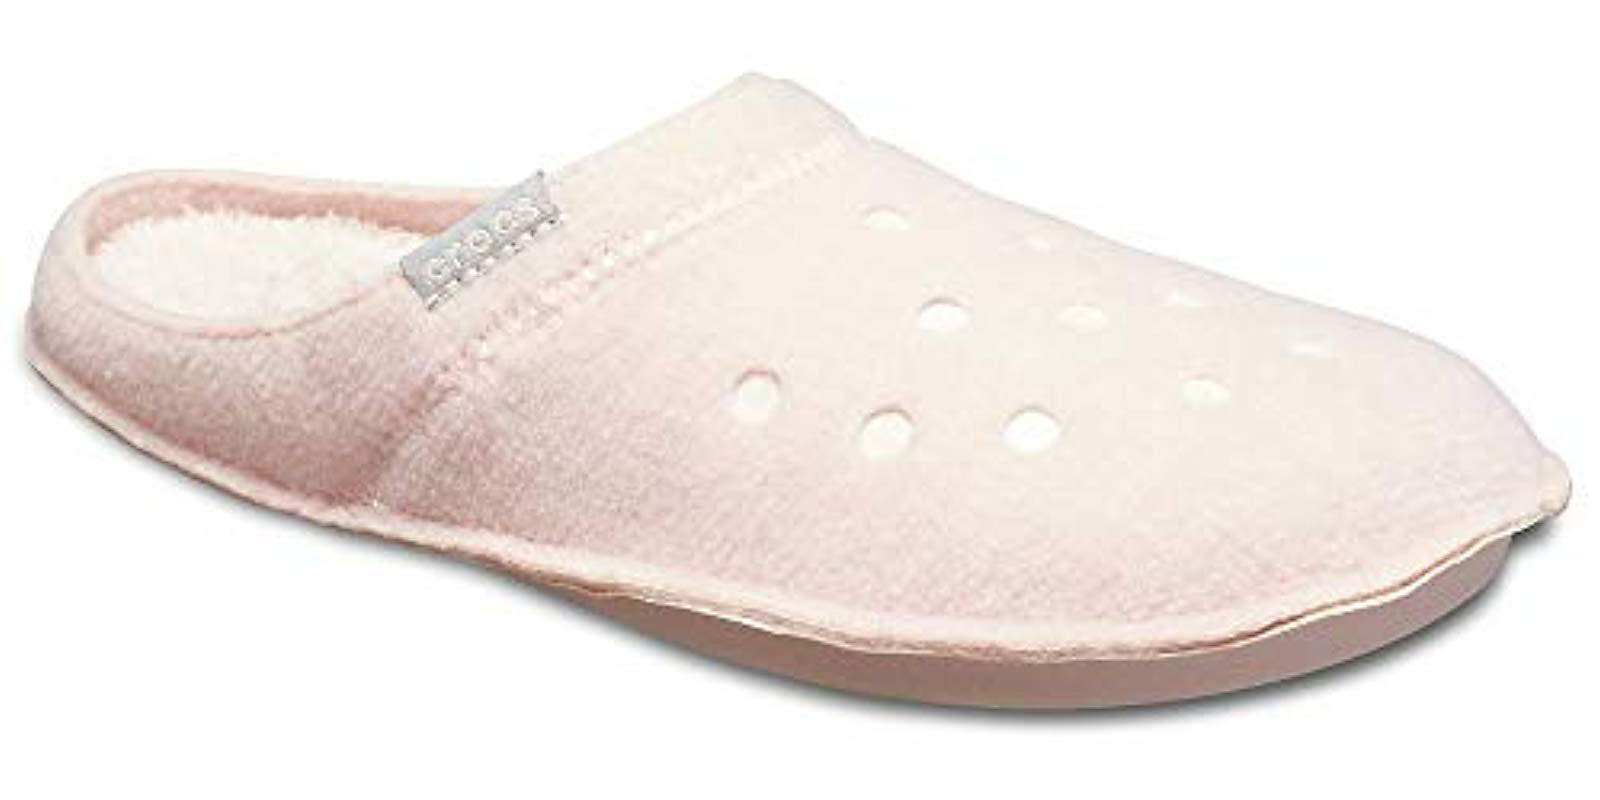 4a25f7984b63d Crocs™ - Pink Classic 203600 Unisex Adult Slippers - Lyst. View fullscreen